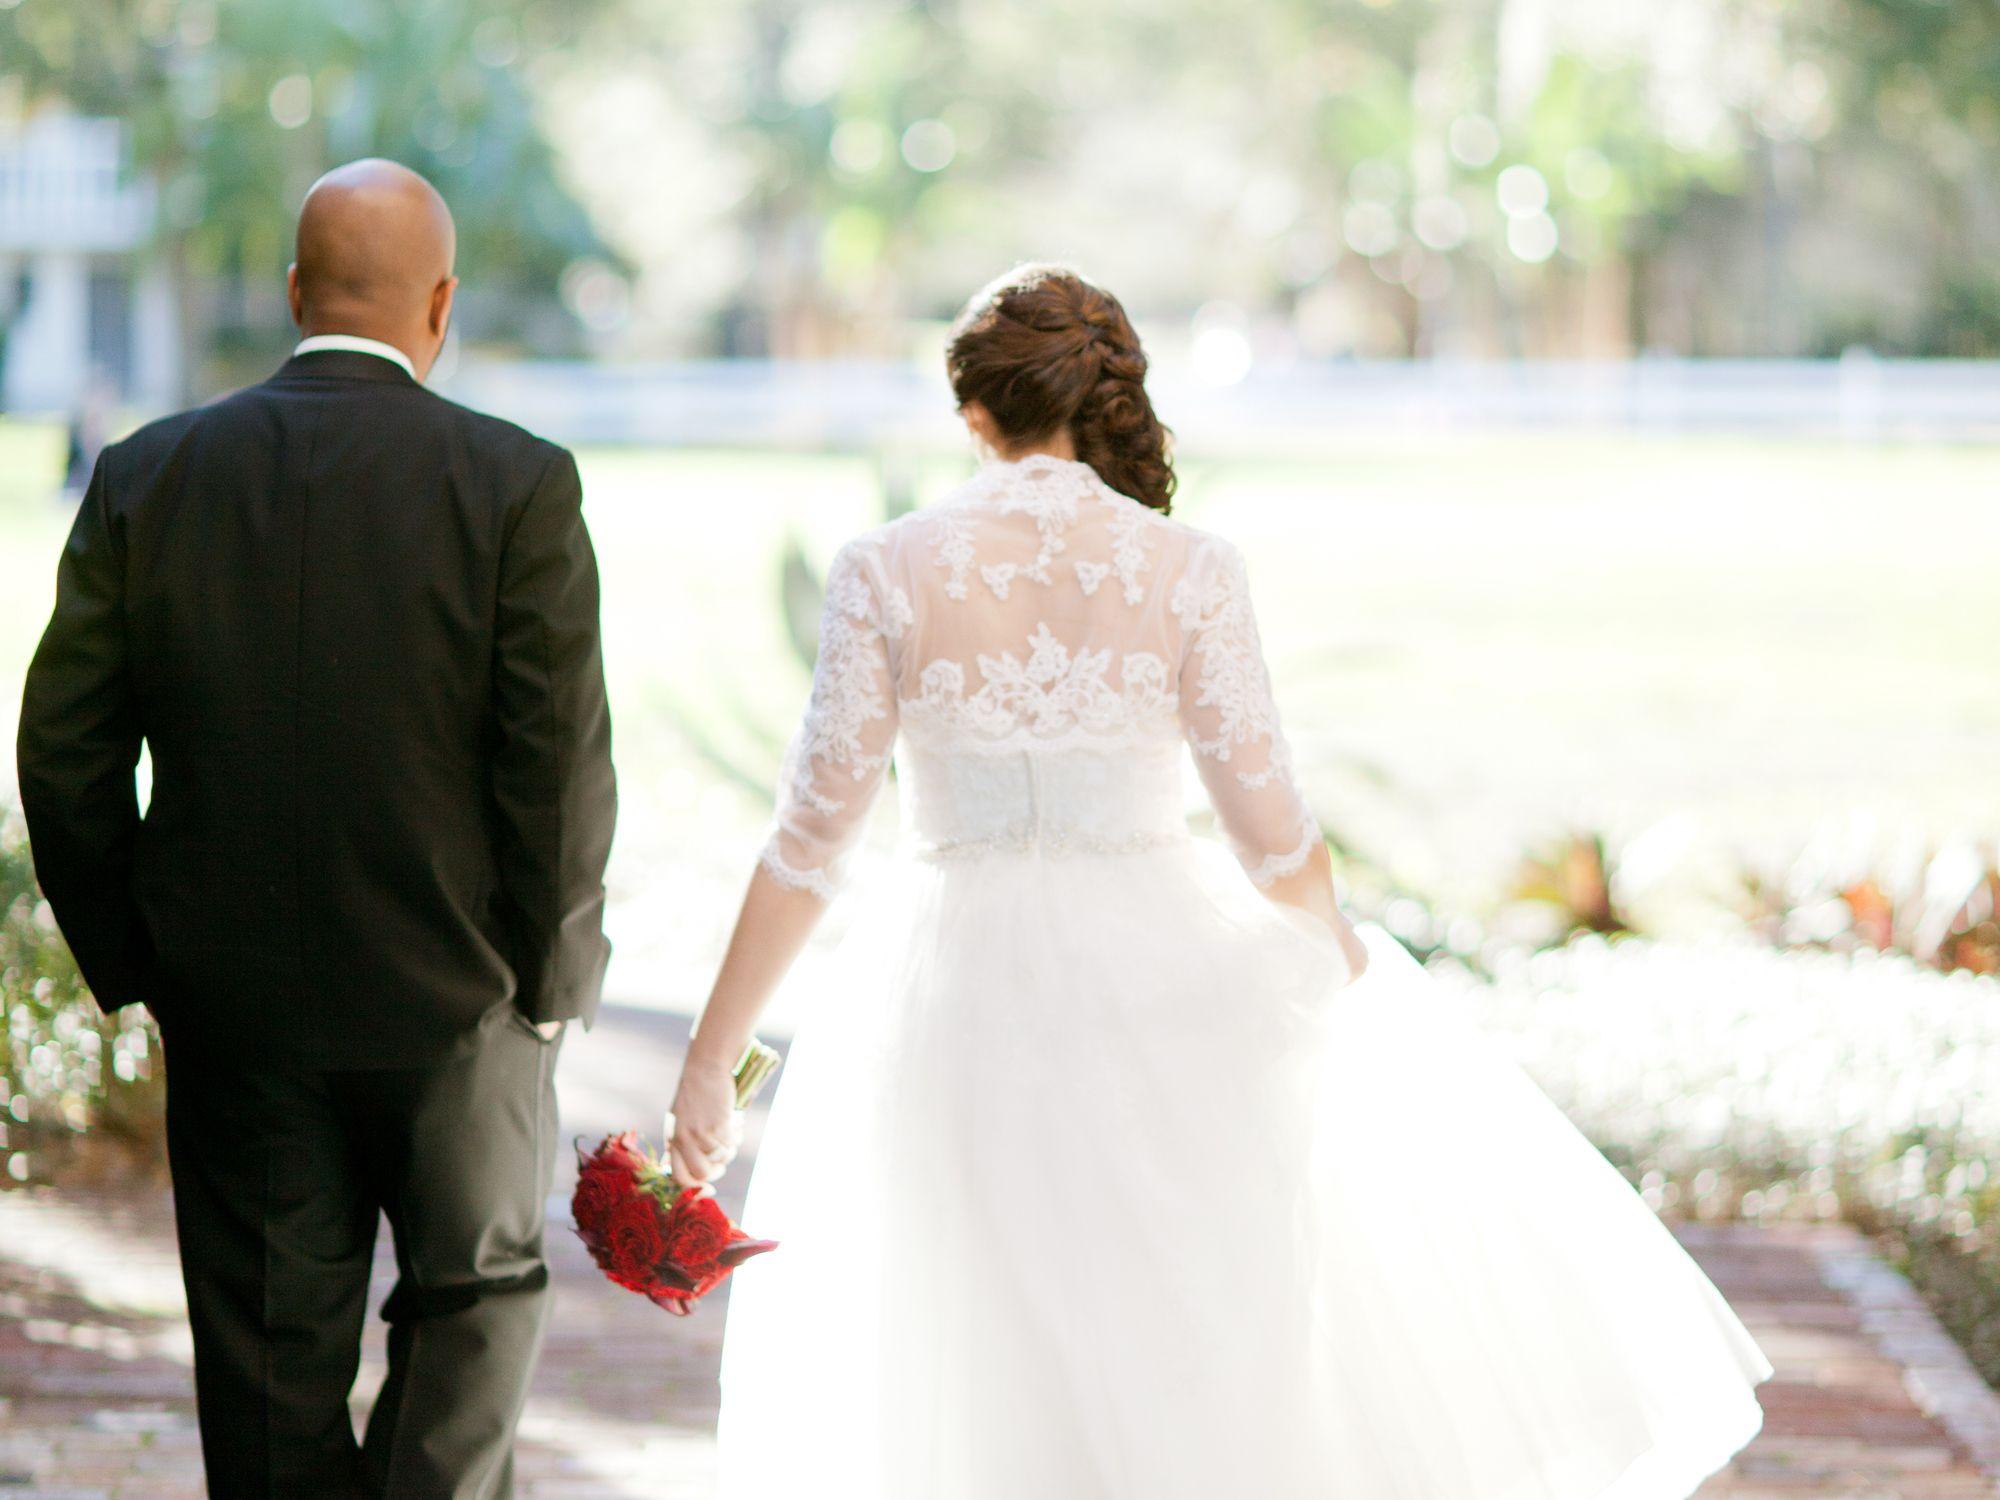 10 Hot Wedding Video Ideas Wedding Videos Wedding Video Wedding Videography